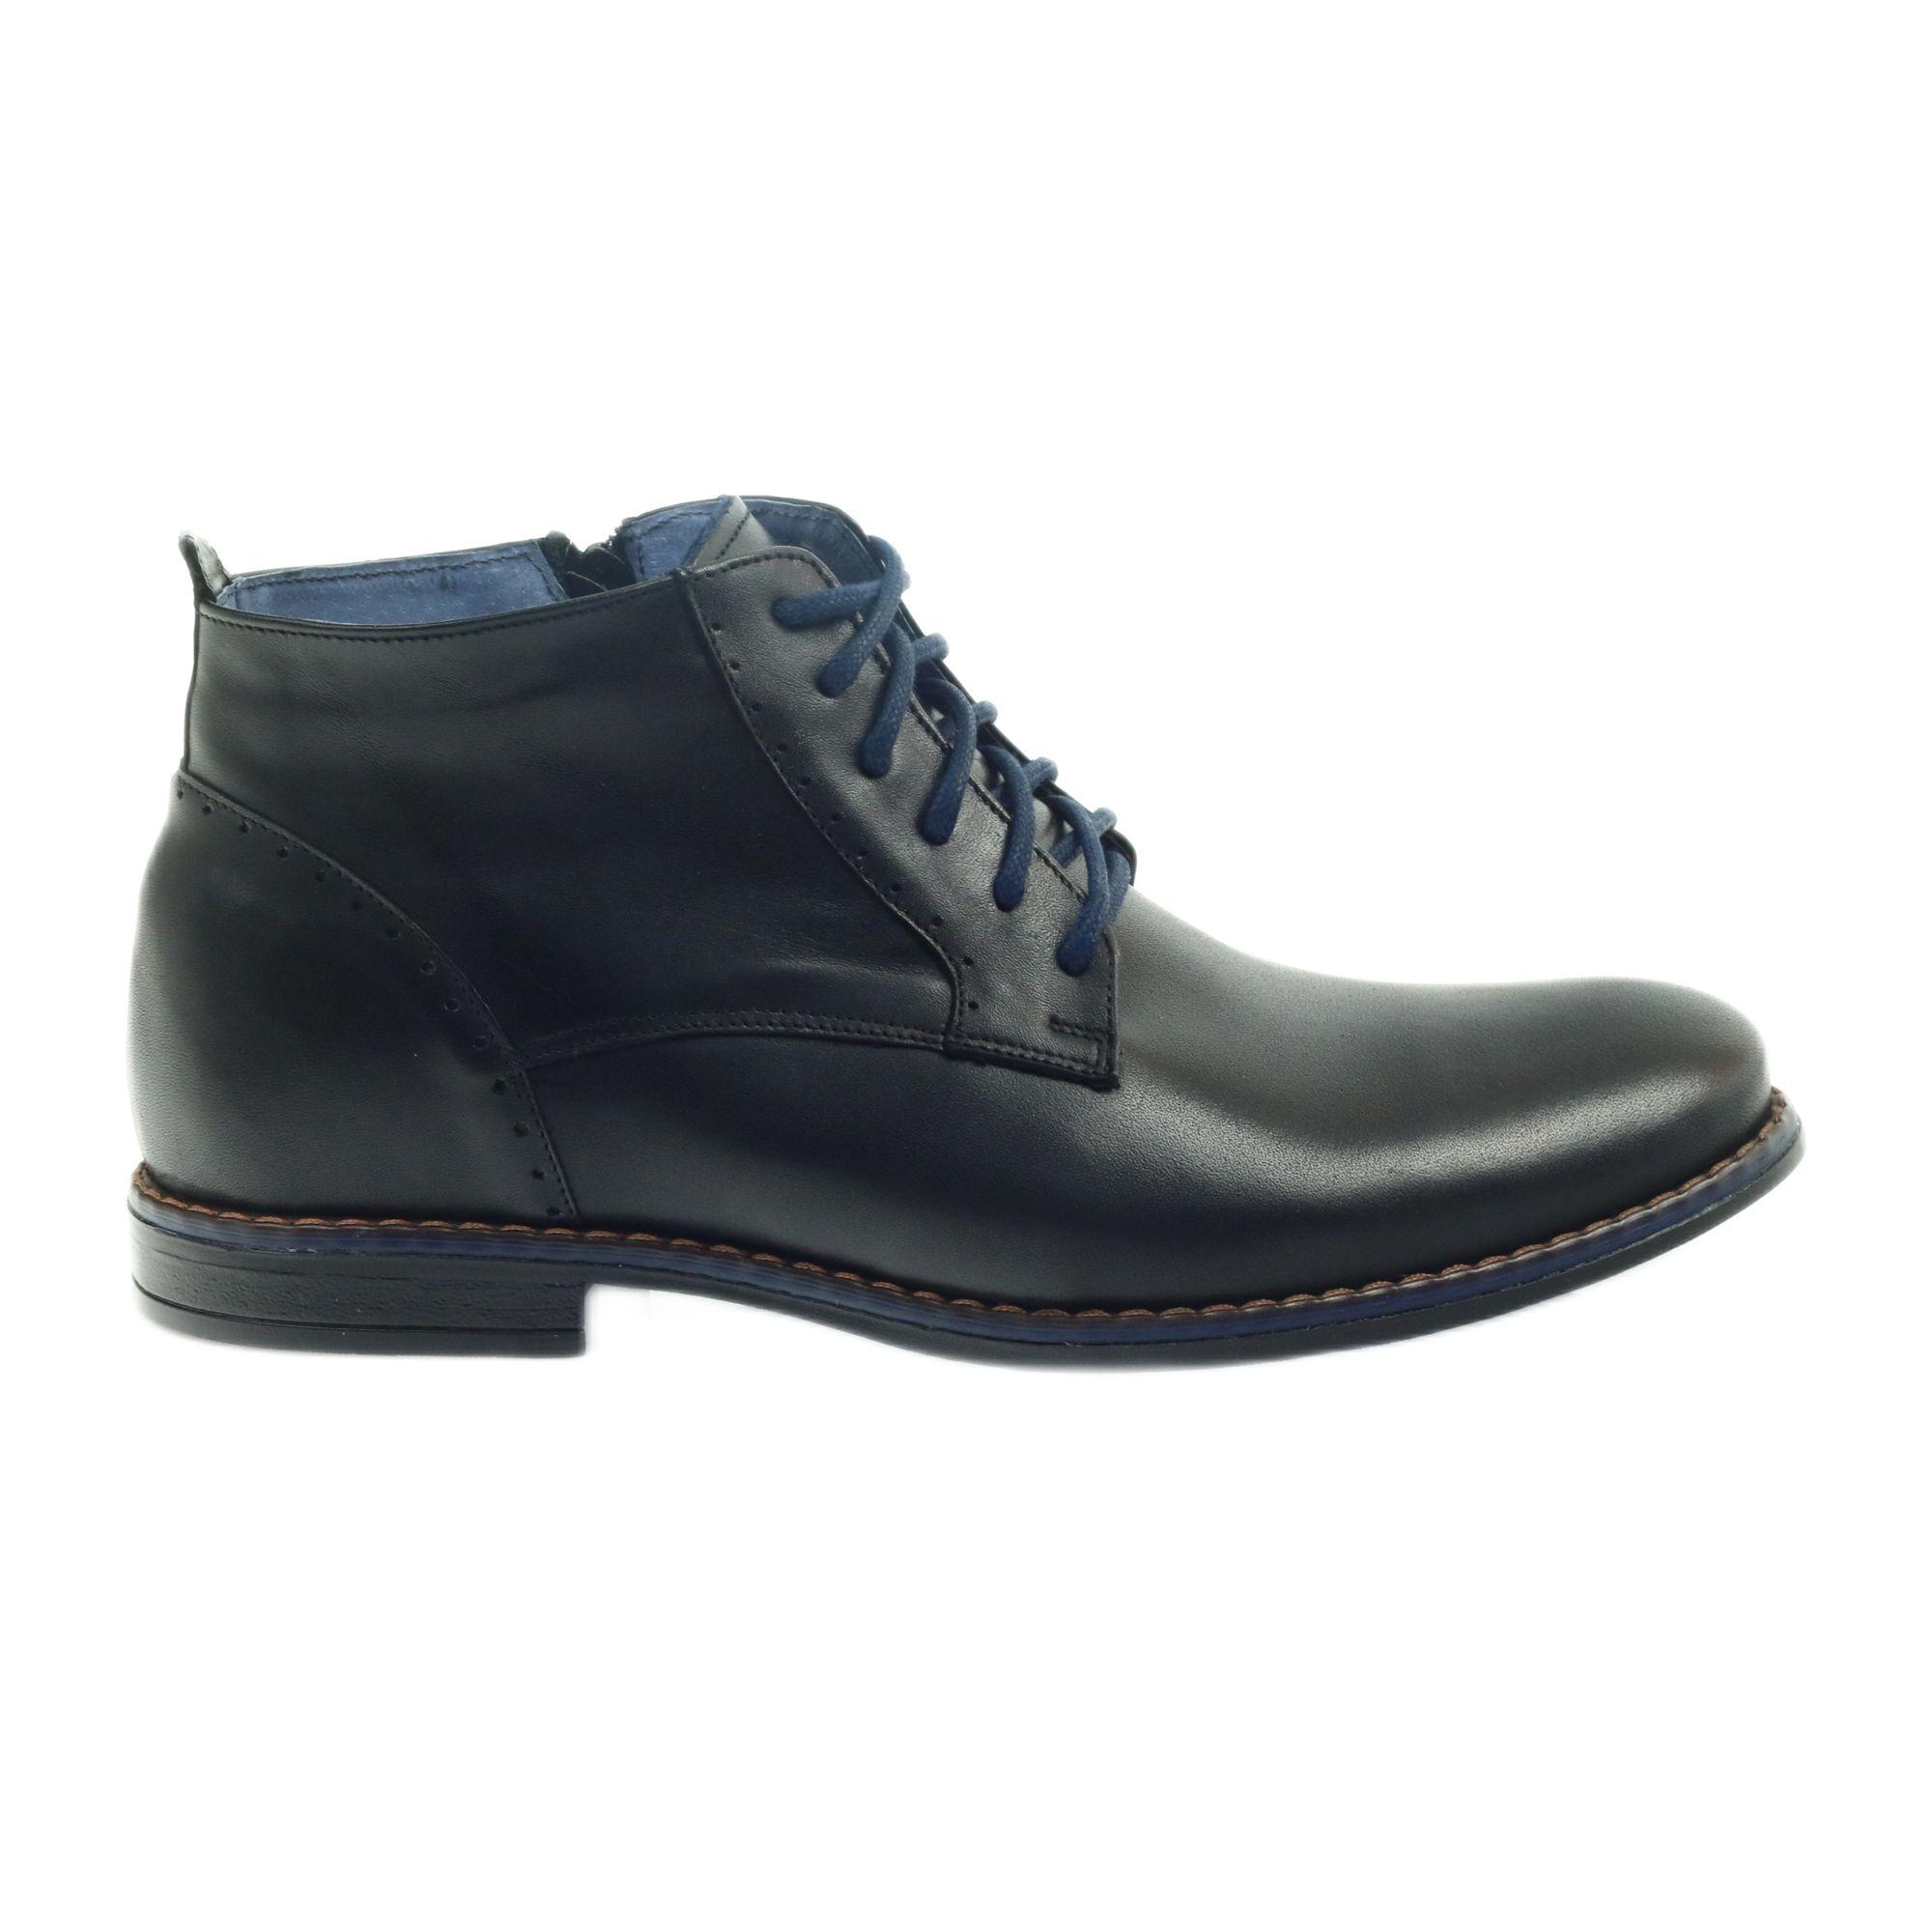 Botki Zimowe Na Suwak Czarne Nikopol 677 Zipper Boots Winter Boots Boots